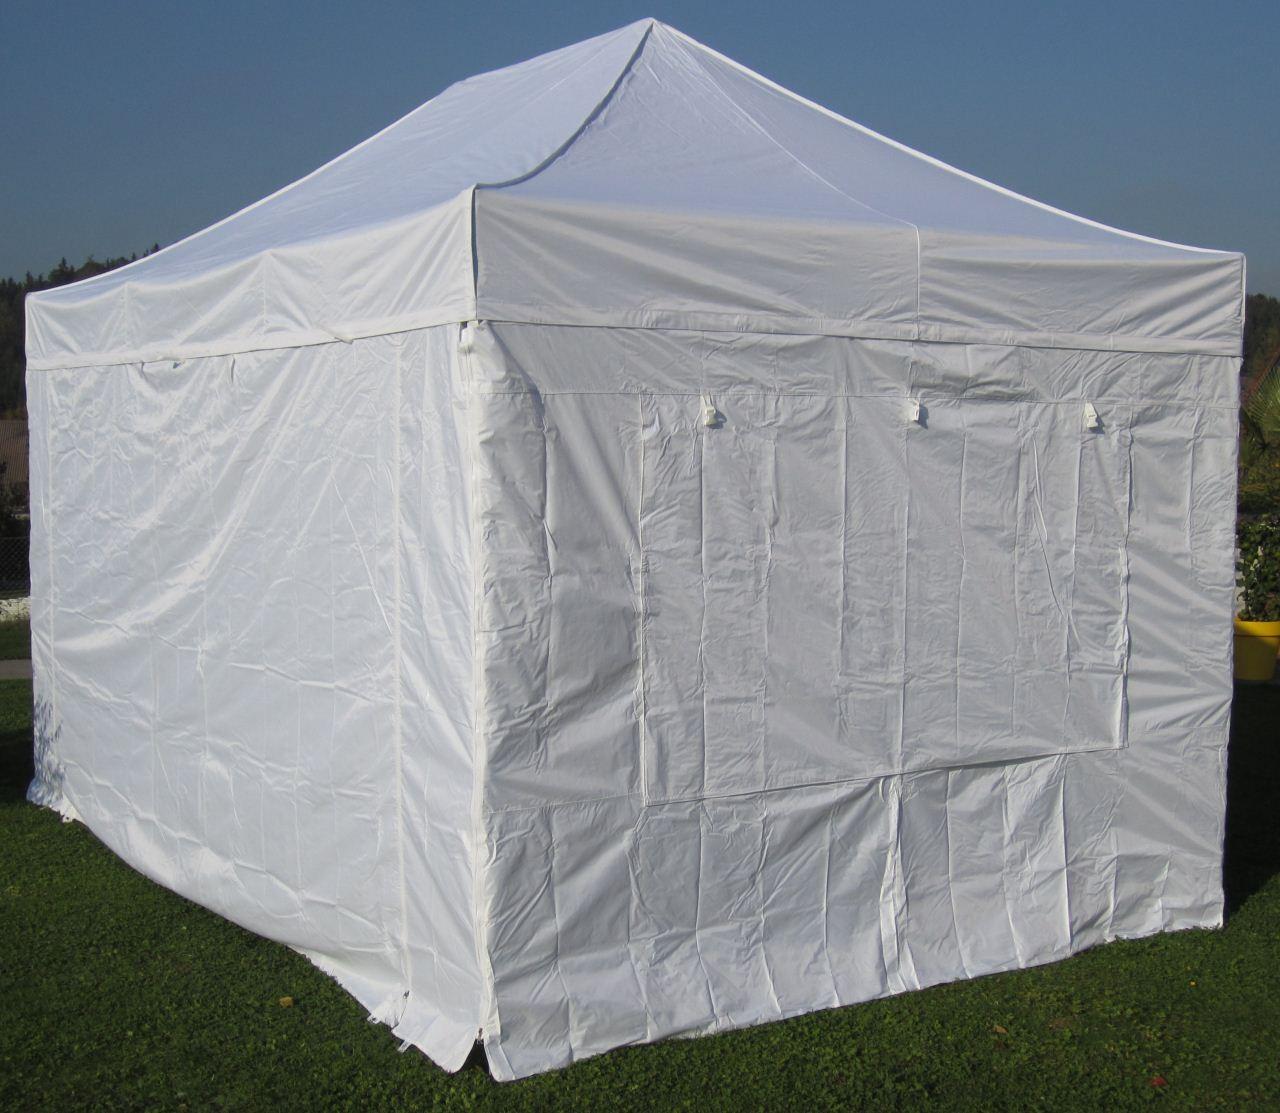 3x4 5m alu profi faltzelt marktzelt marktstand tent 50mm. Black Bedroom Furniture Sets. Home Design Ideas